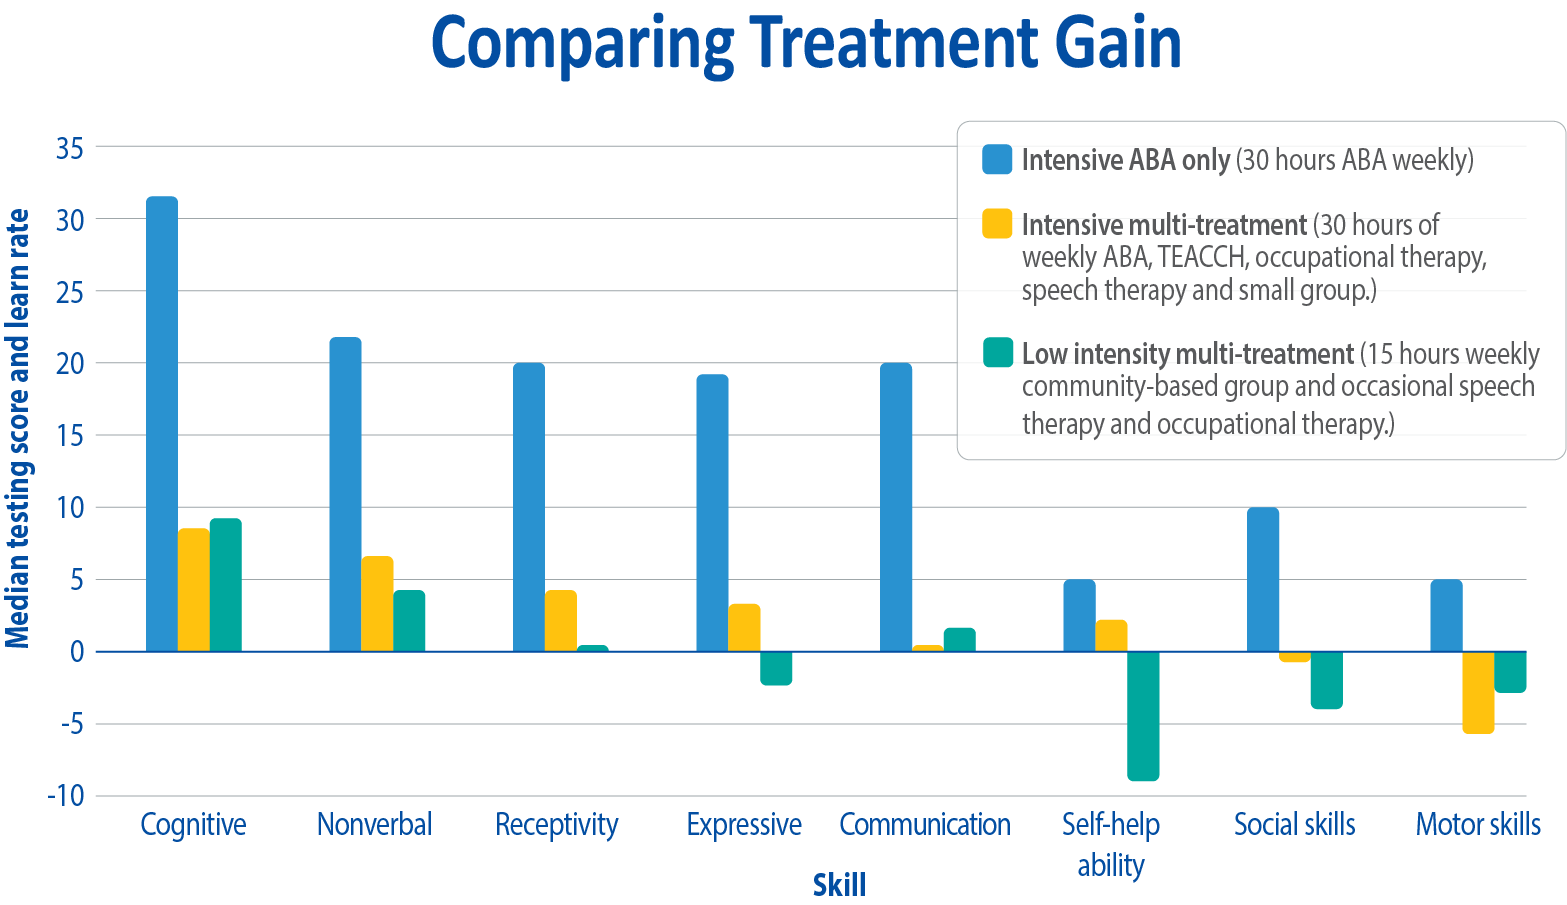 aba-comparing-treatment-gain-english